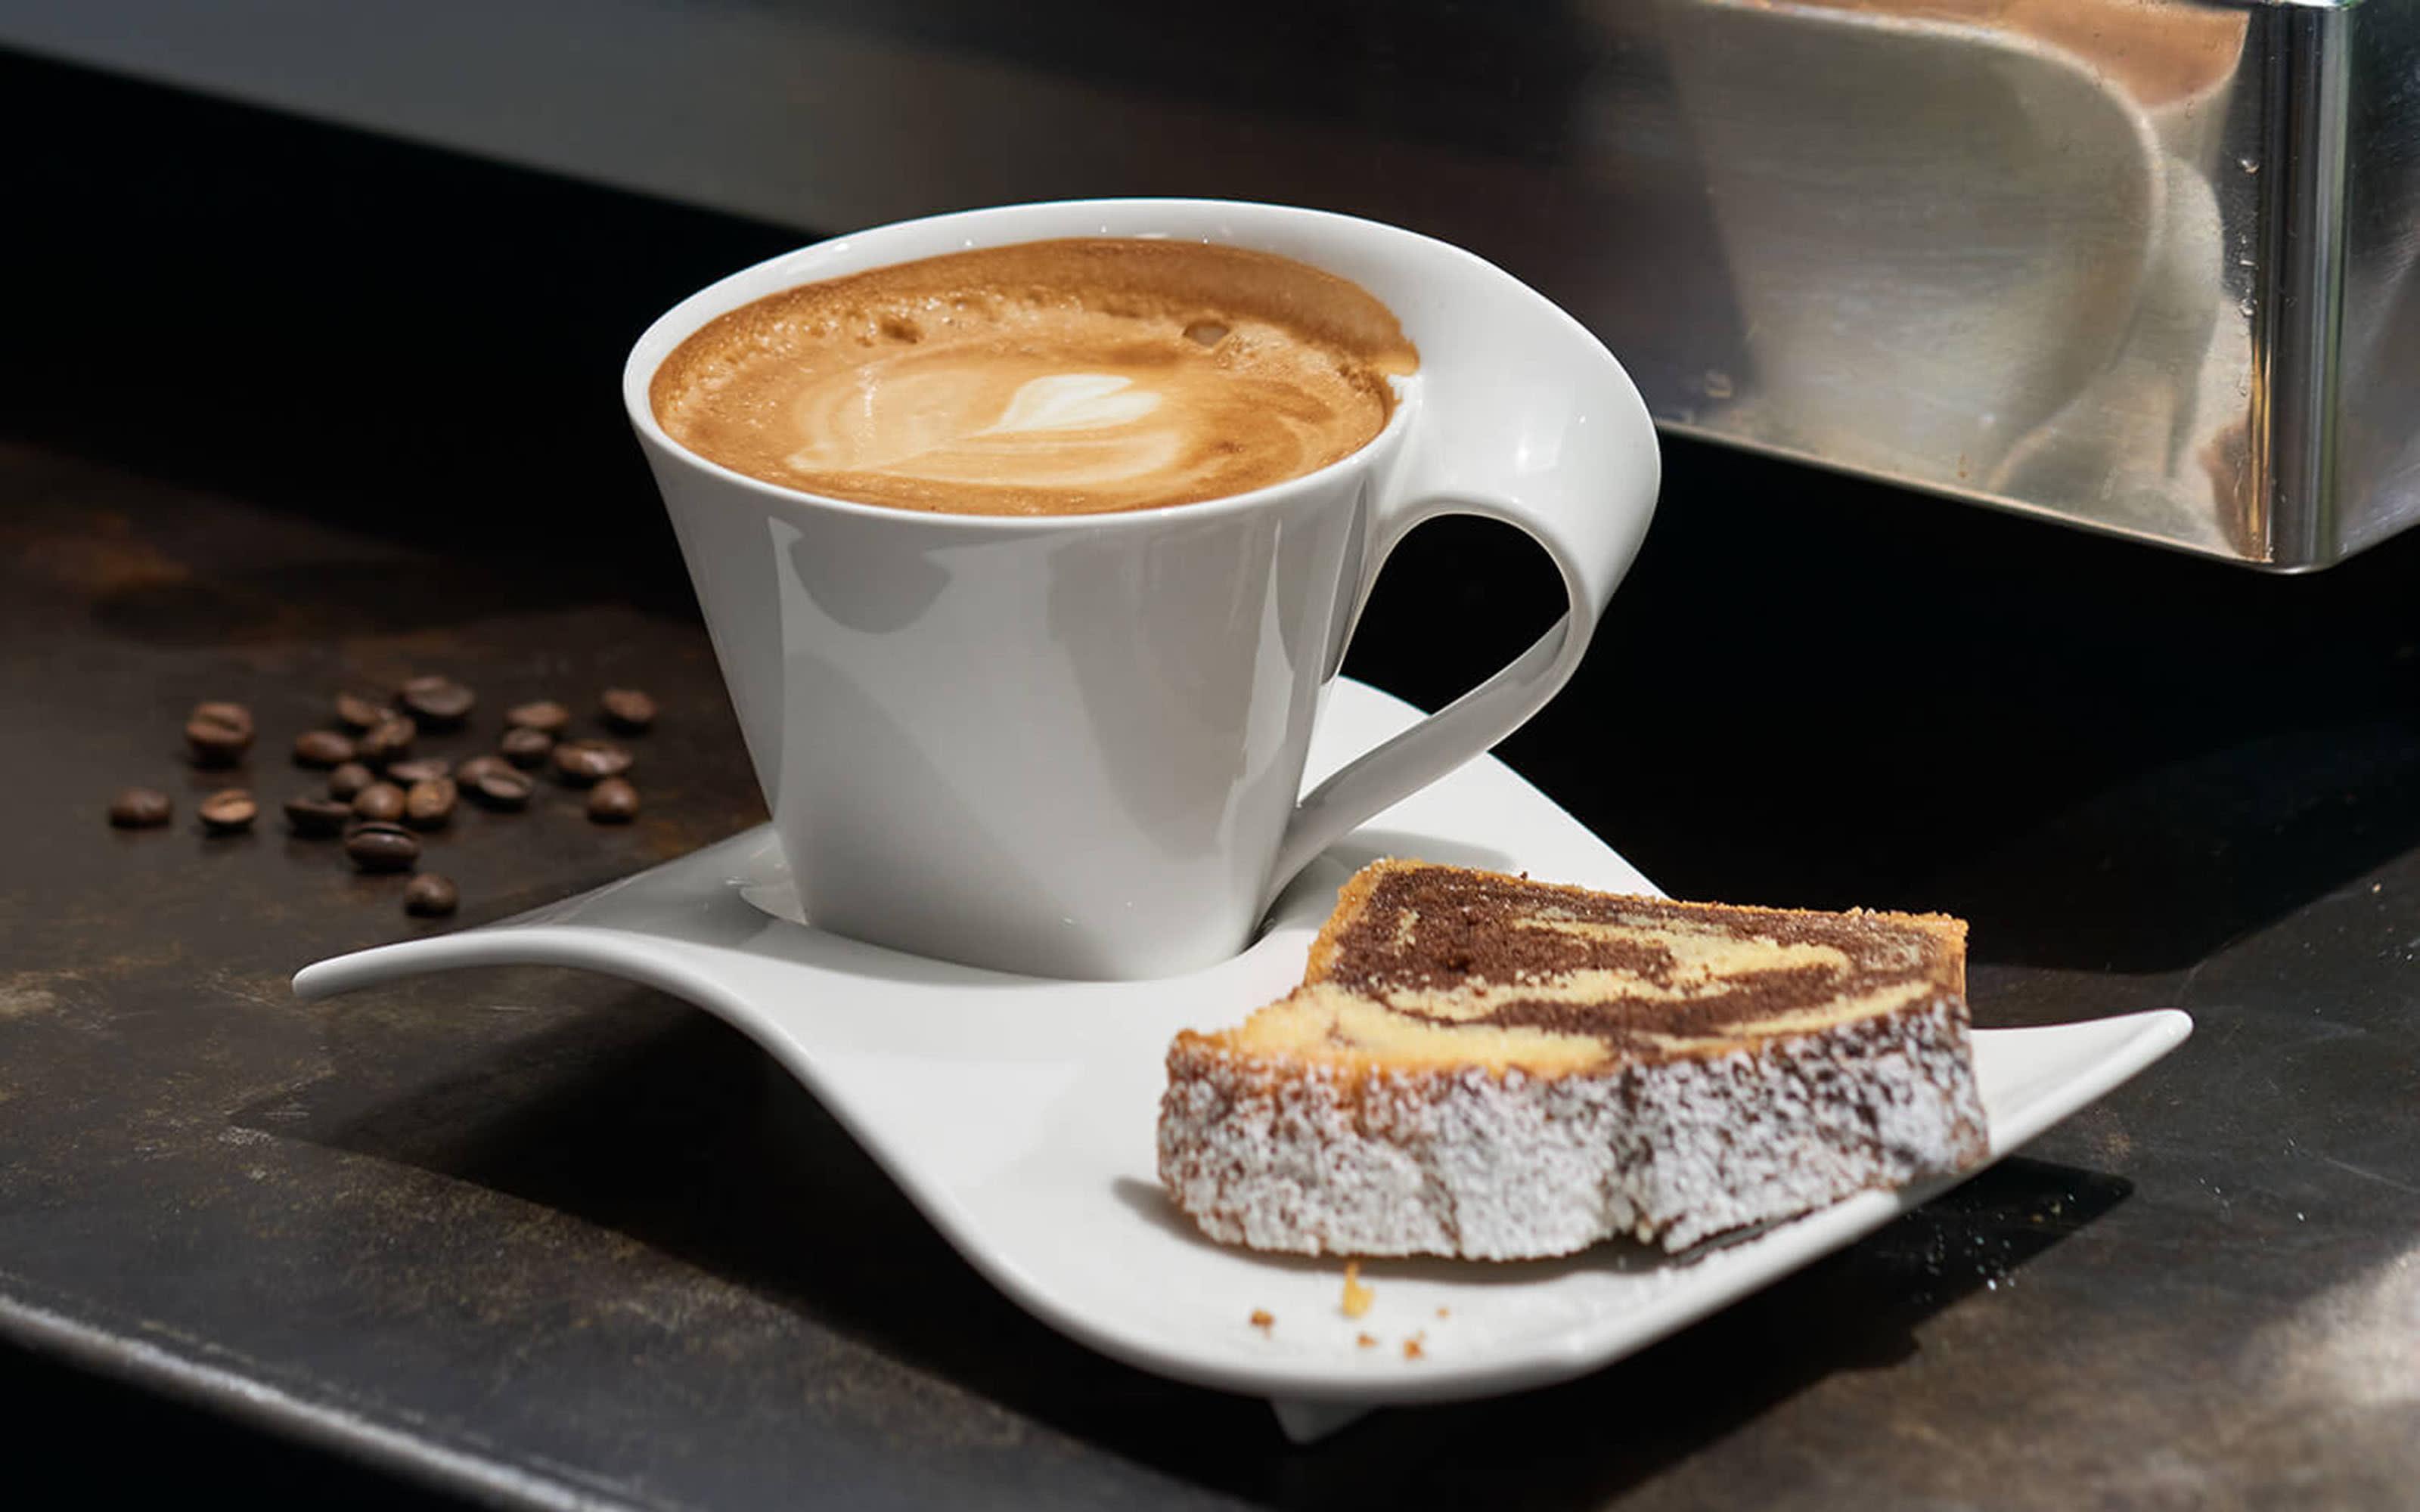 Cafe au lait Obertasse New Wave Cafe in weiß, 0,4 l